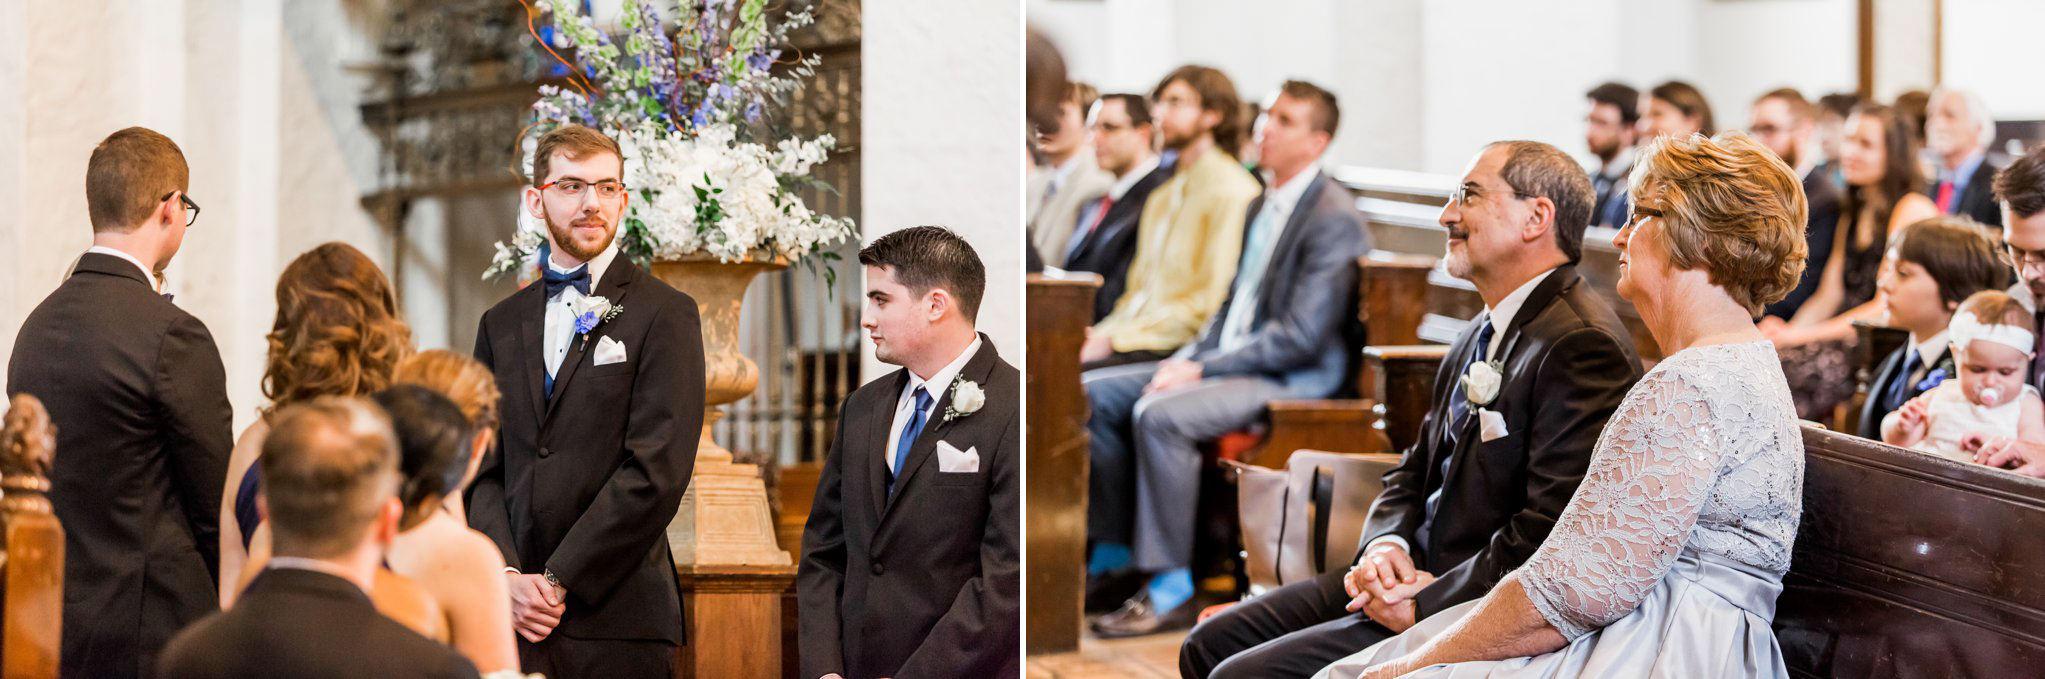 Rollins Chapel + Orlando Science Center Gay LGBT Dinosaur Themed Wedding Adam + Craig 22.jpg